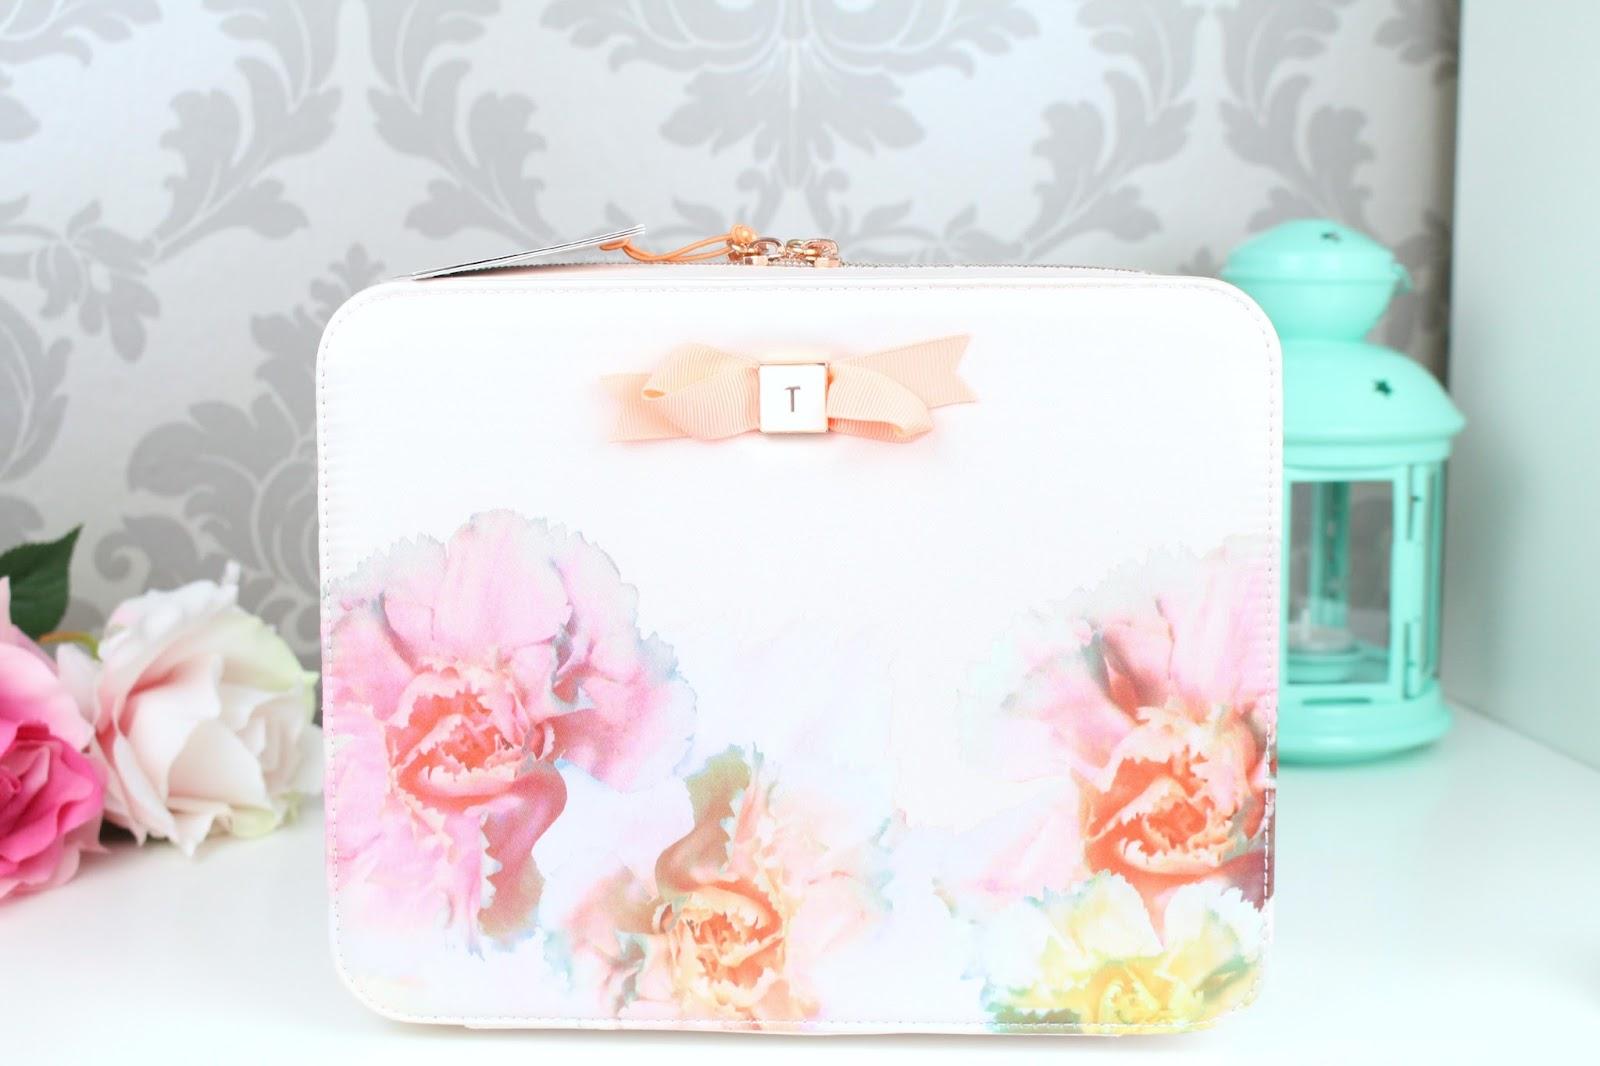 buy popular b0b8b 93a33 Ted Baker Handbag And Purse Set